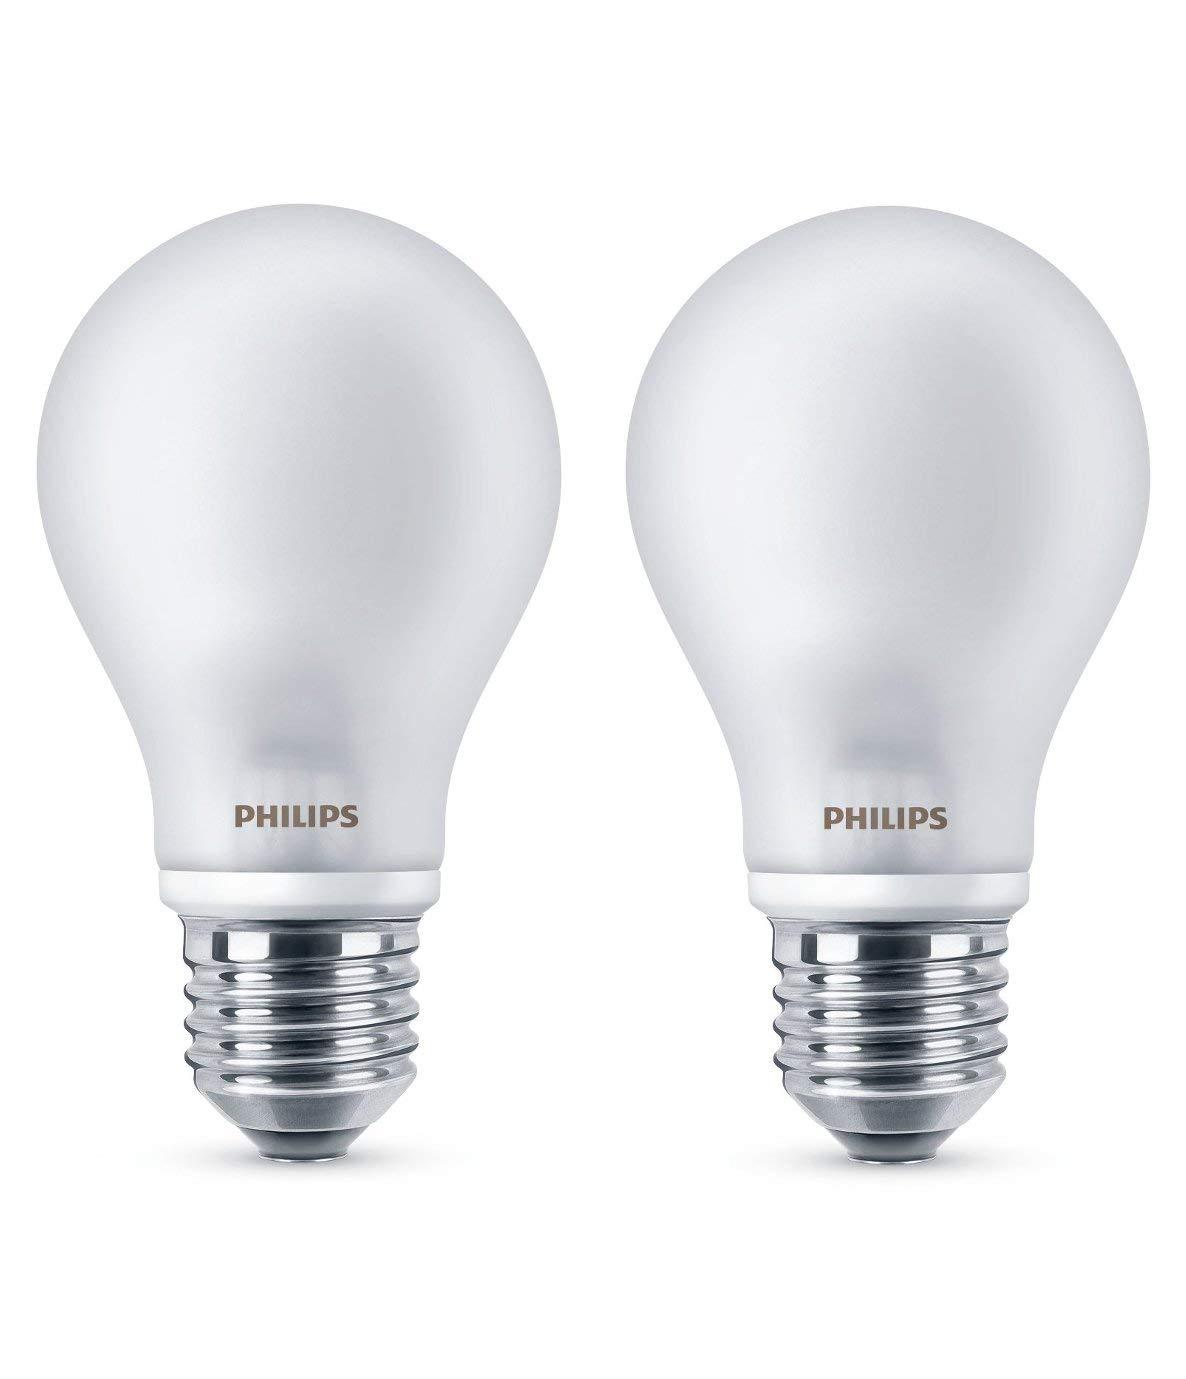 Philips Lighting Bombilla LEDclassic E27, 40 W, Cálida, Pack de 2, 2: Amazon.es: Iluminación